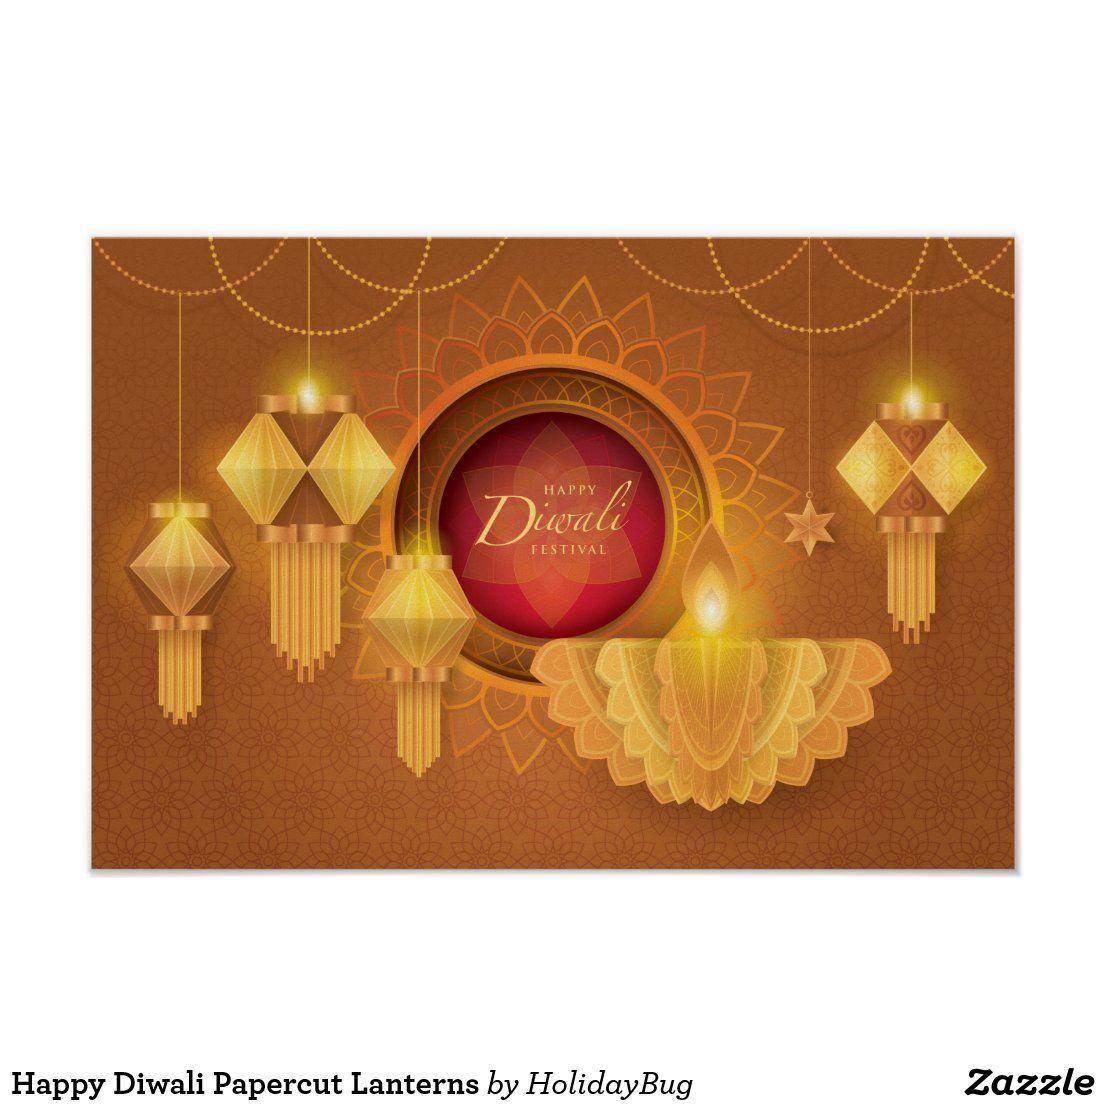 Happy Diwali Papercut Lanterns Poster in 2020